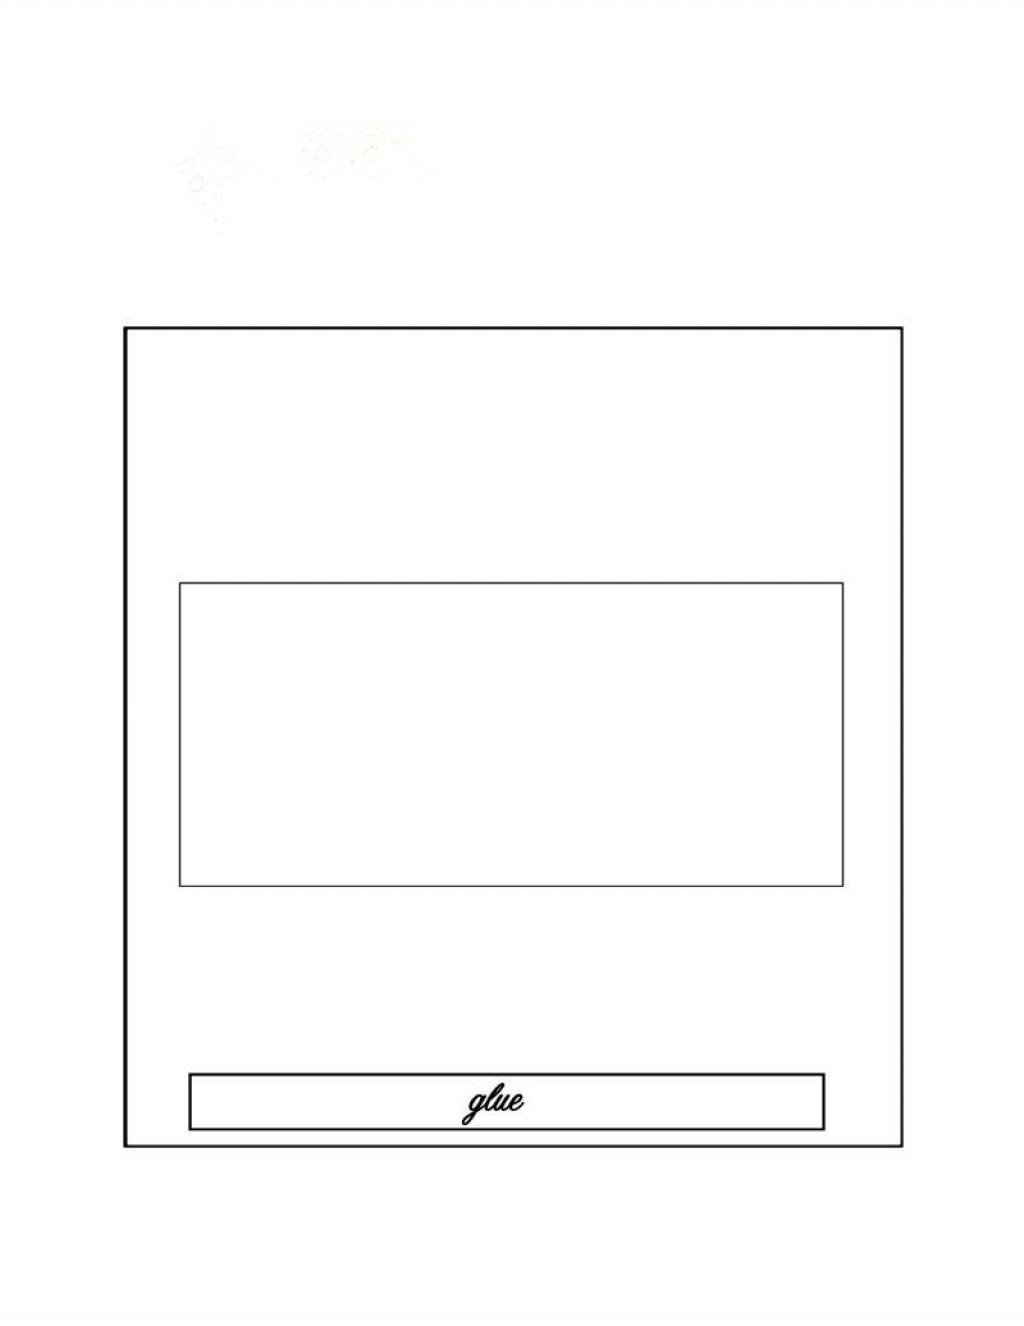 006 Wondrou Candy Bar Wrapper Template Measurement Example  DimensionLarge